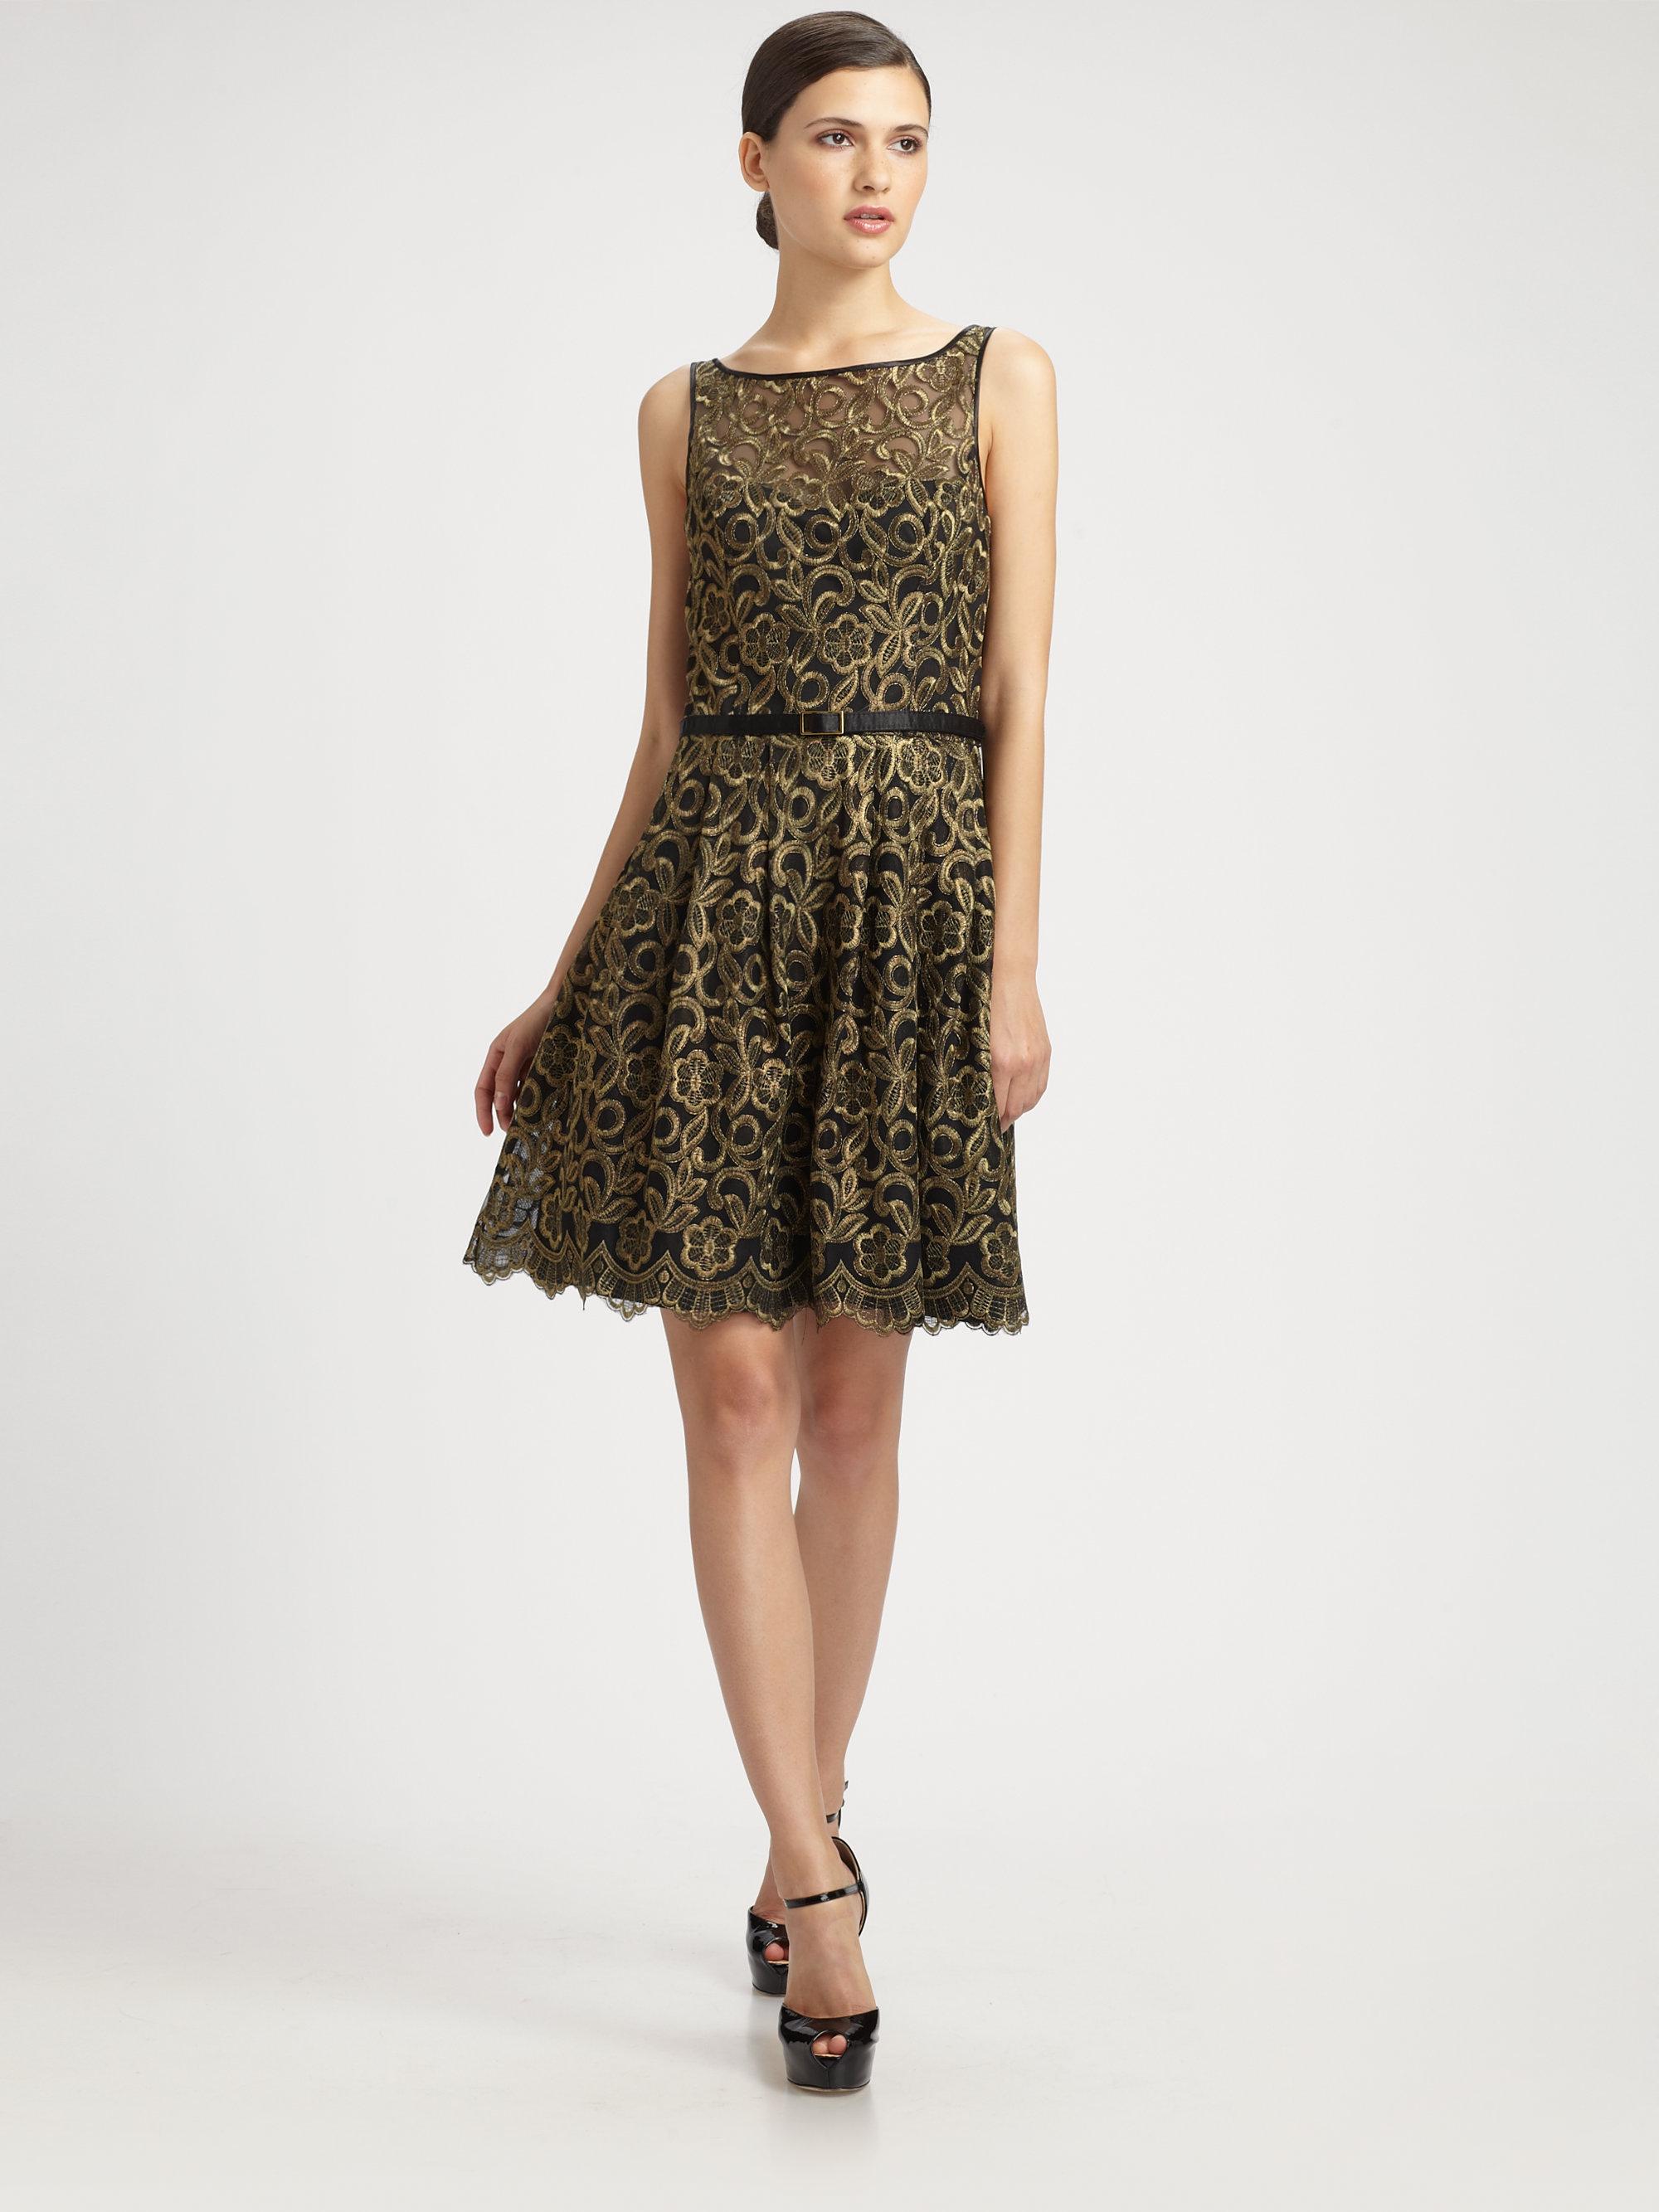 Aidan mattox gold lace dress